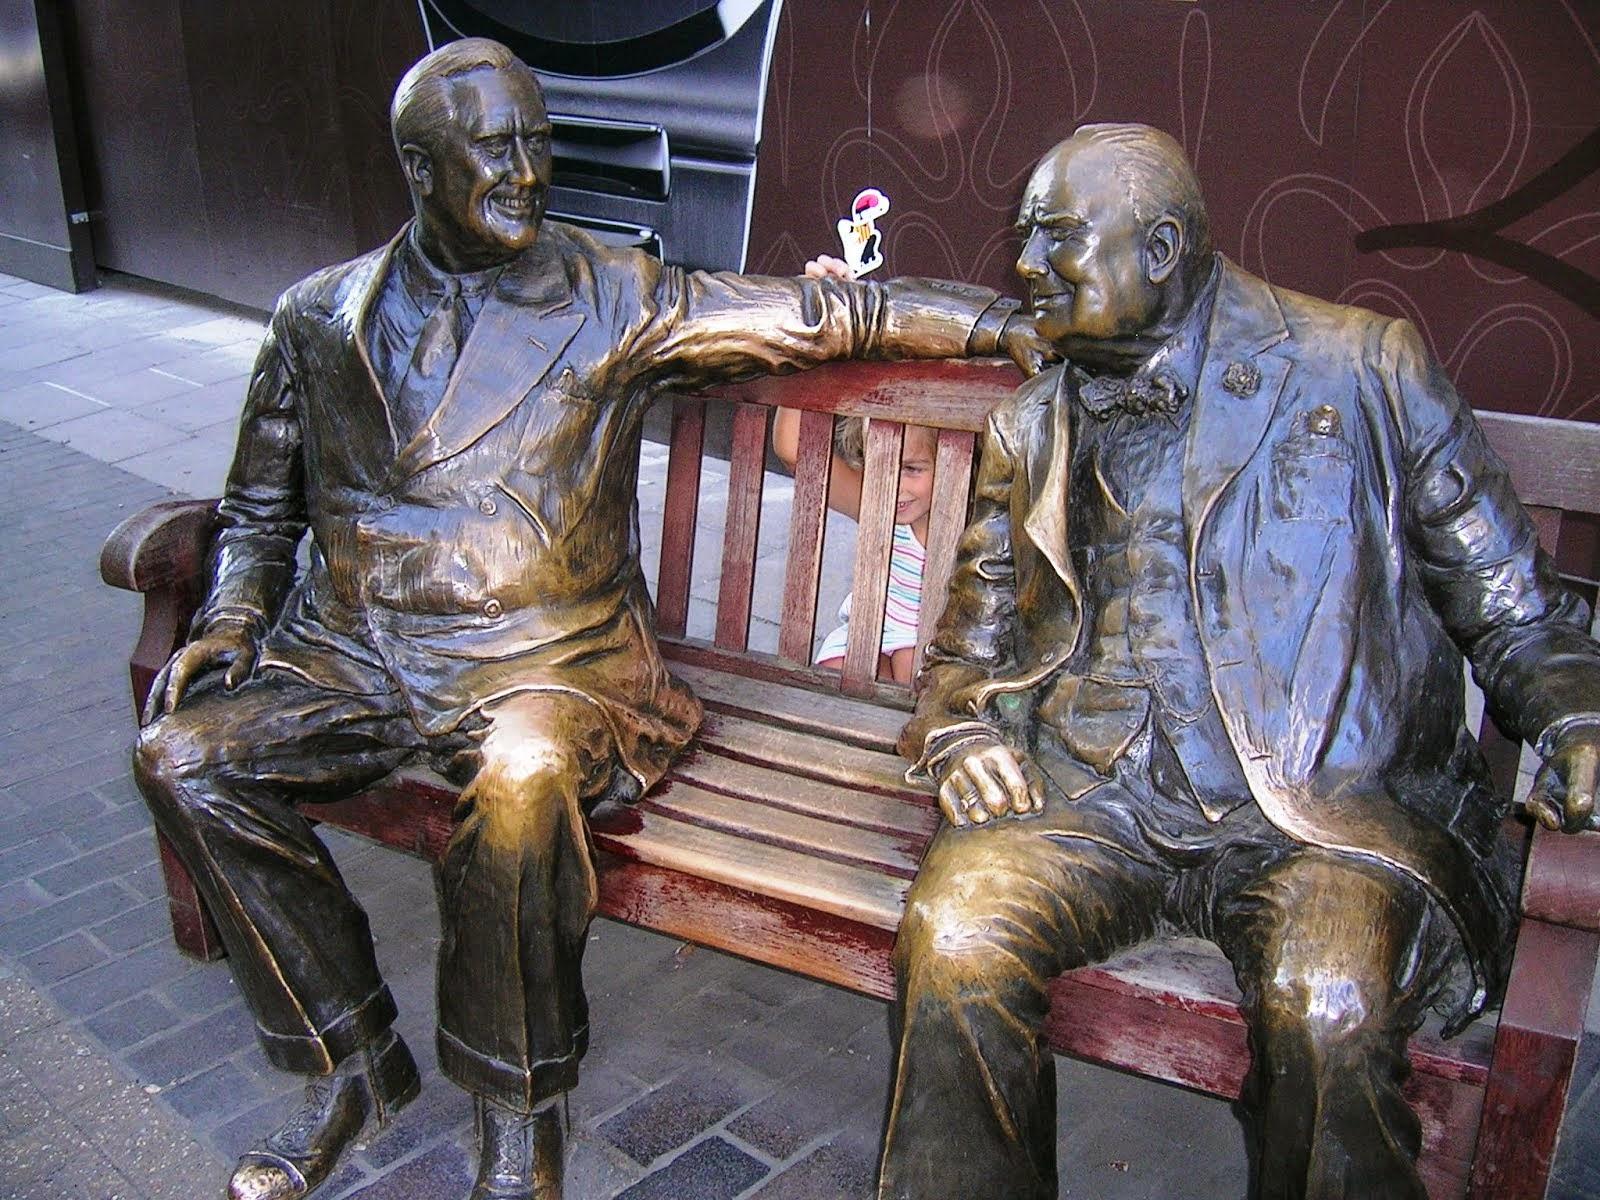 Winston Churchill assegut al costat del catganer.